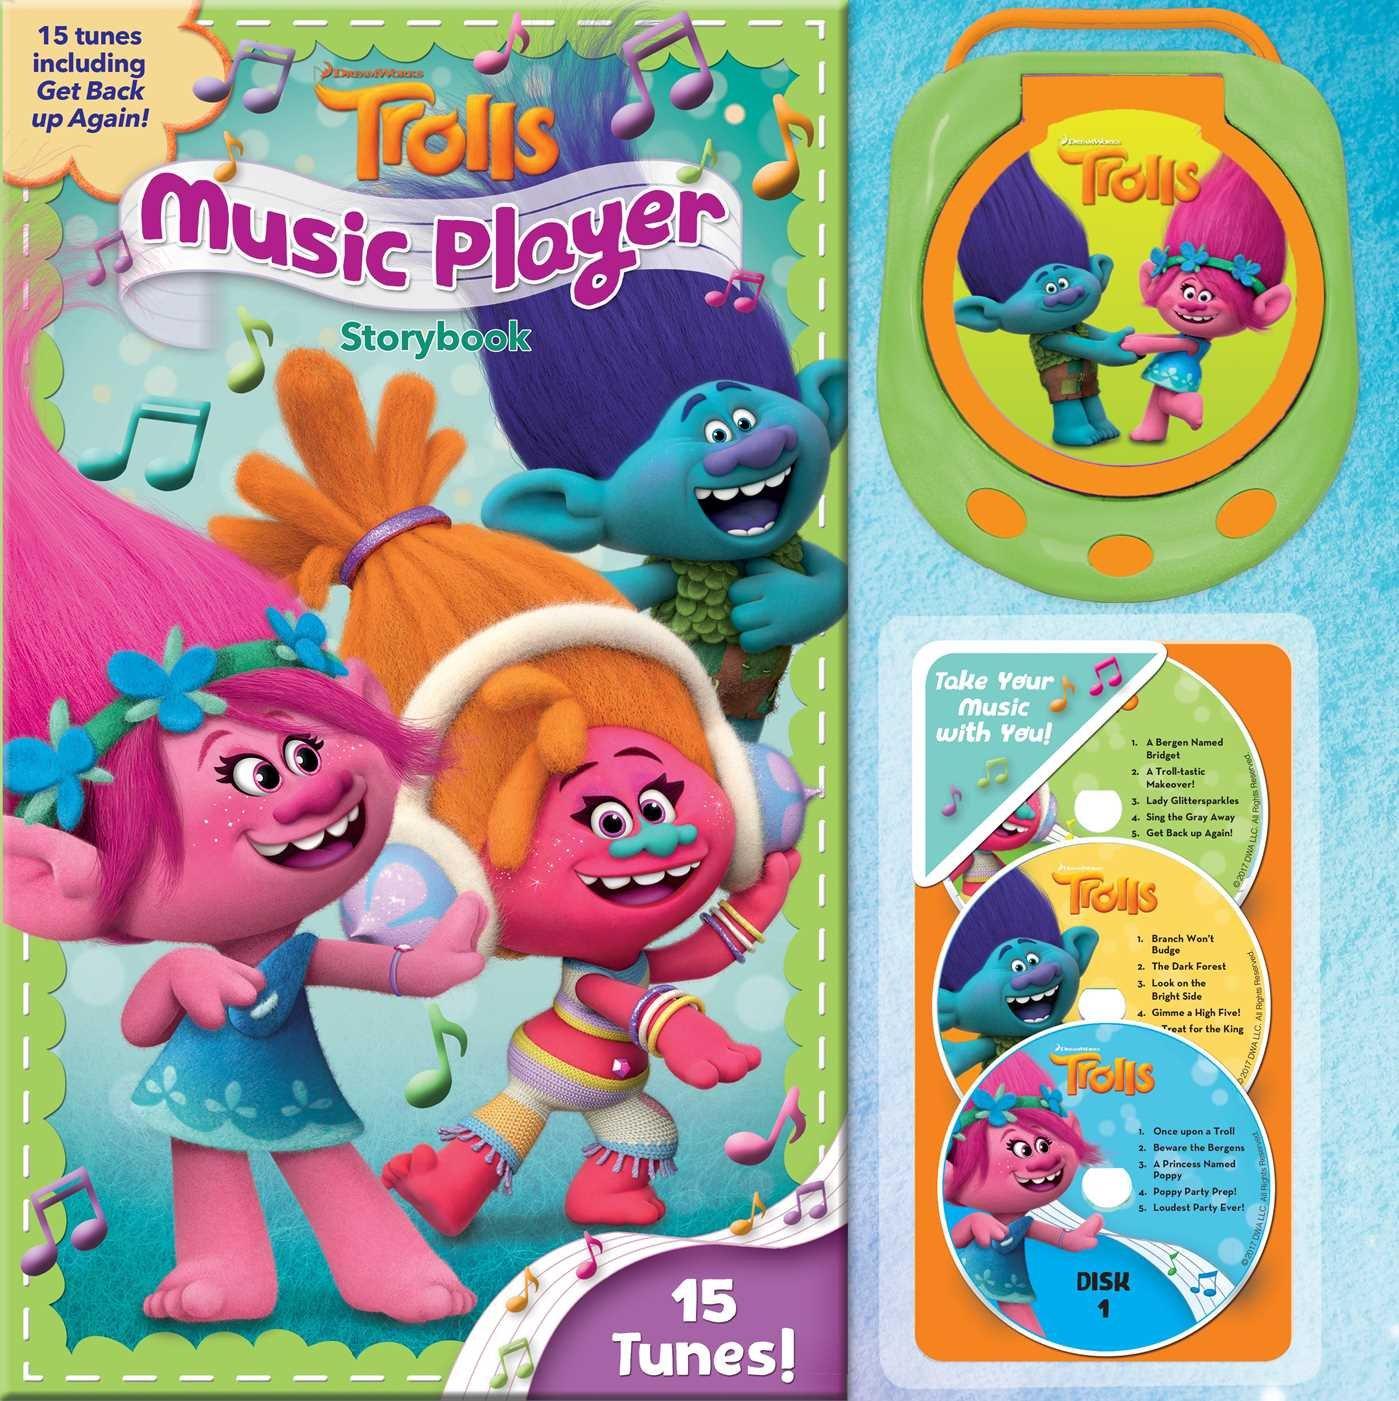 DreamWorks Trolls Music Player Storybook: Barbara Layman